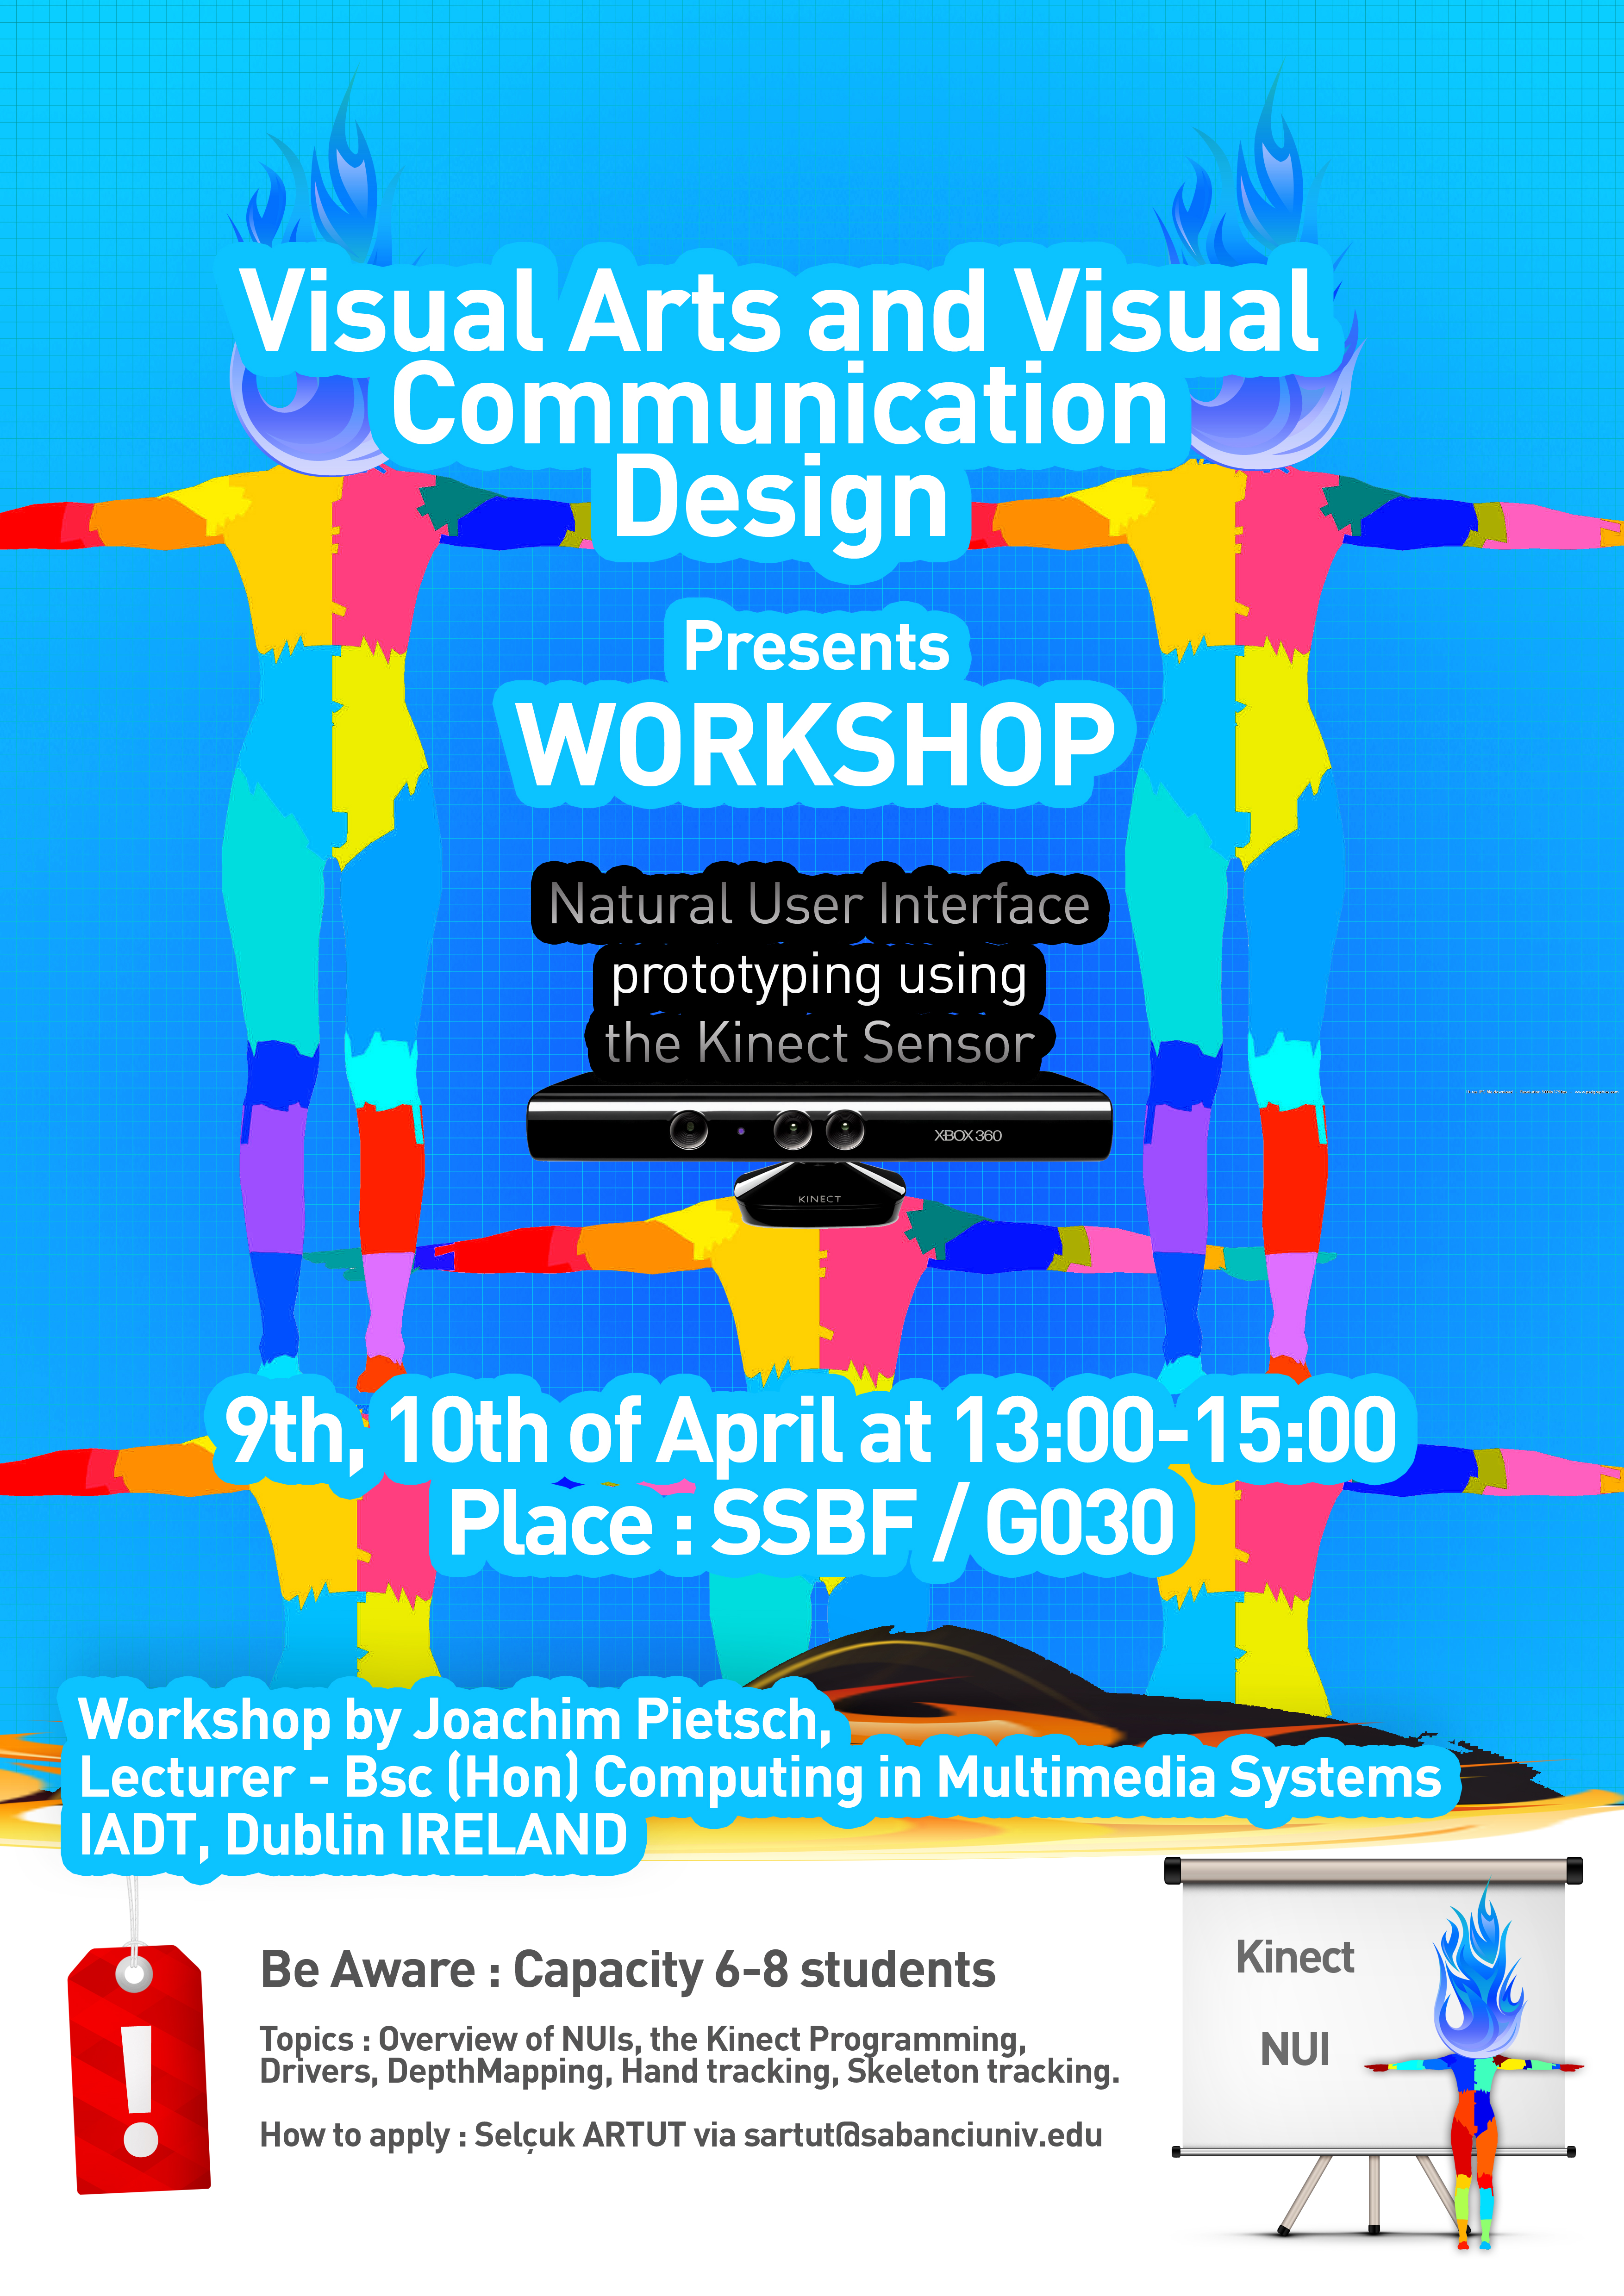 visual arts and visual communication design workshop by joachim pietsch